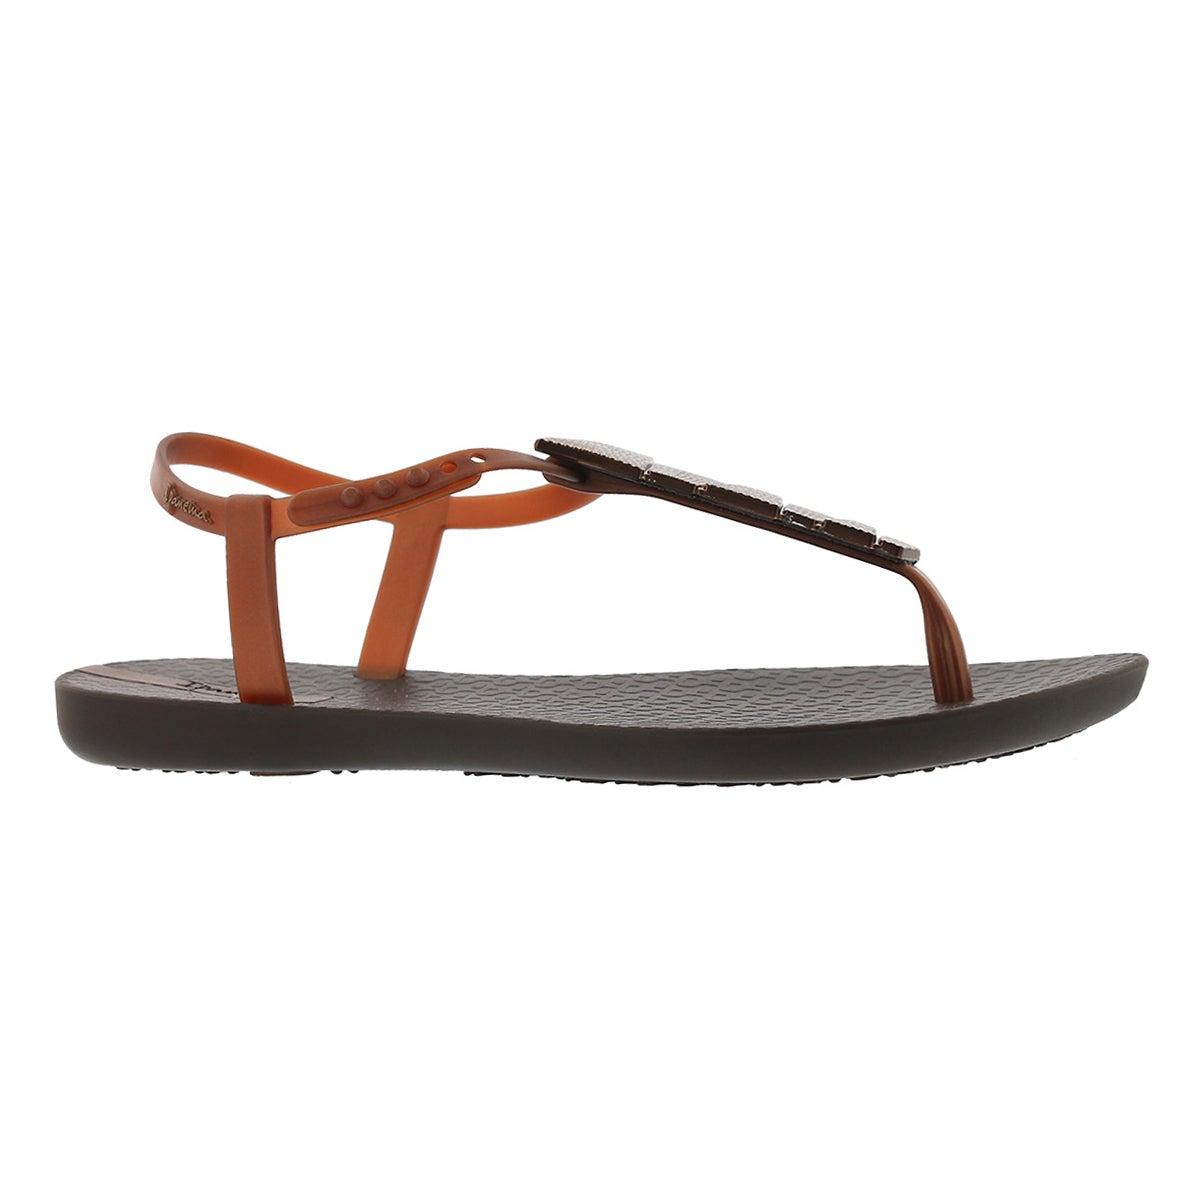 Women's CHARM V SAND brn/brz t-strap sandals